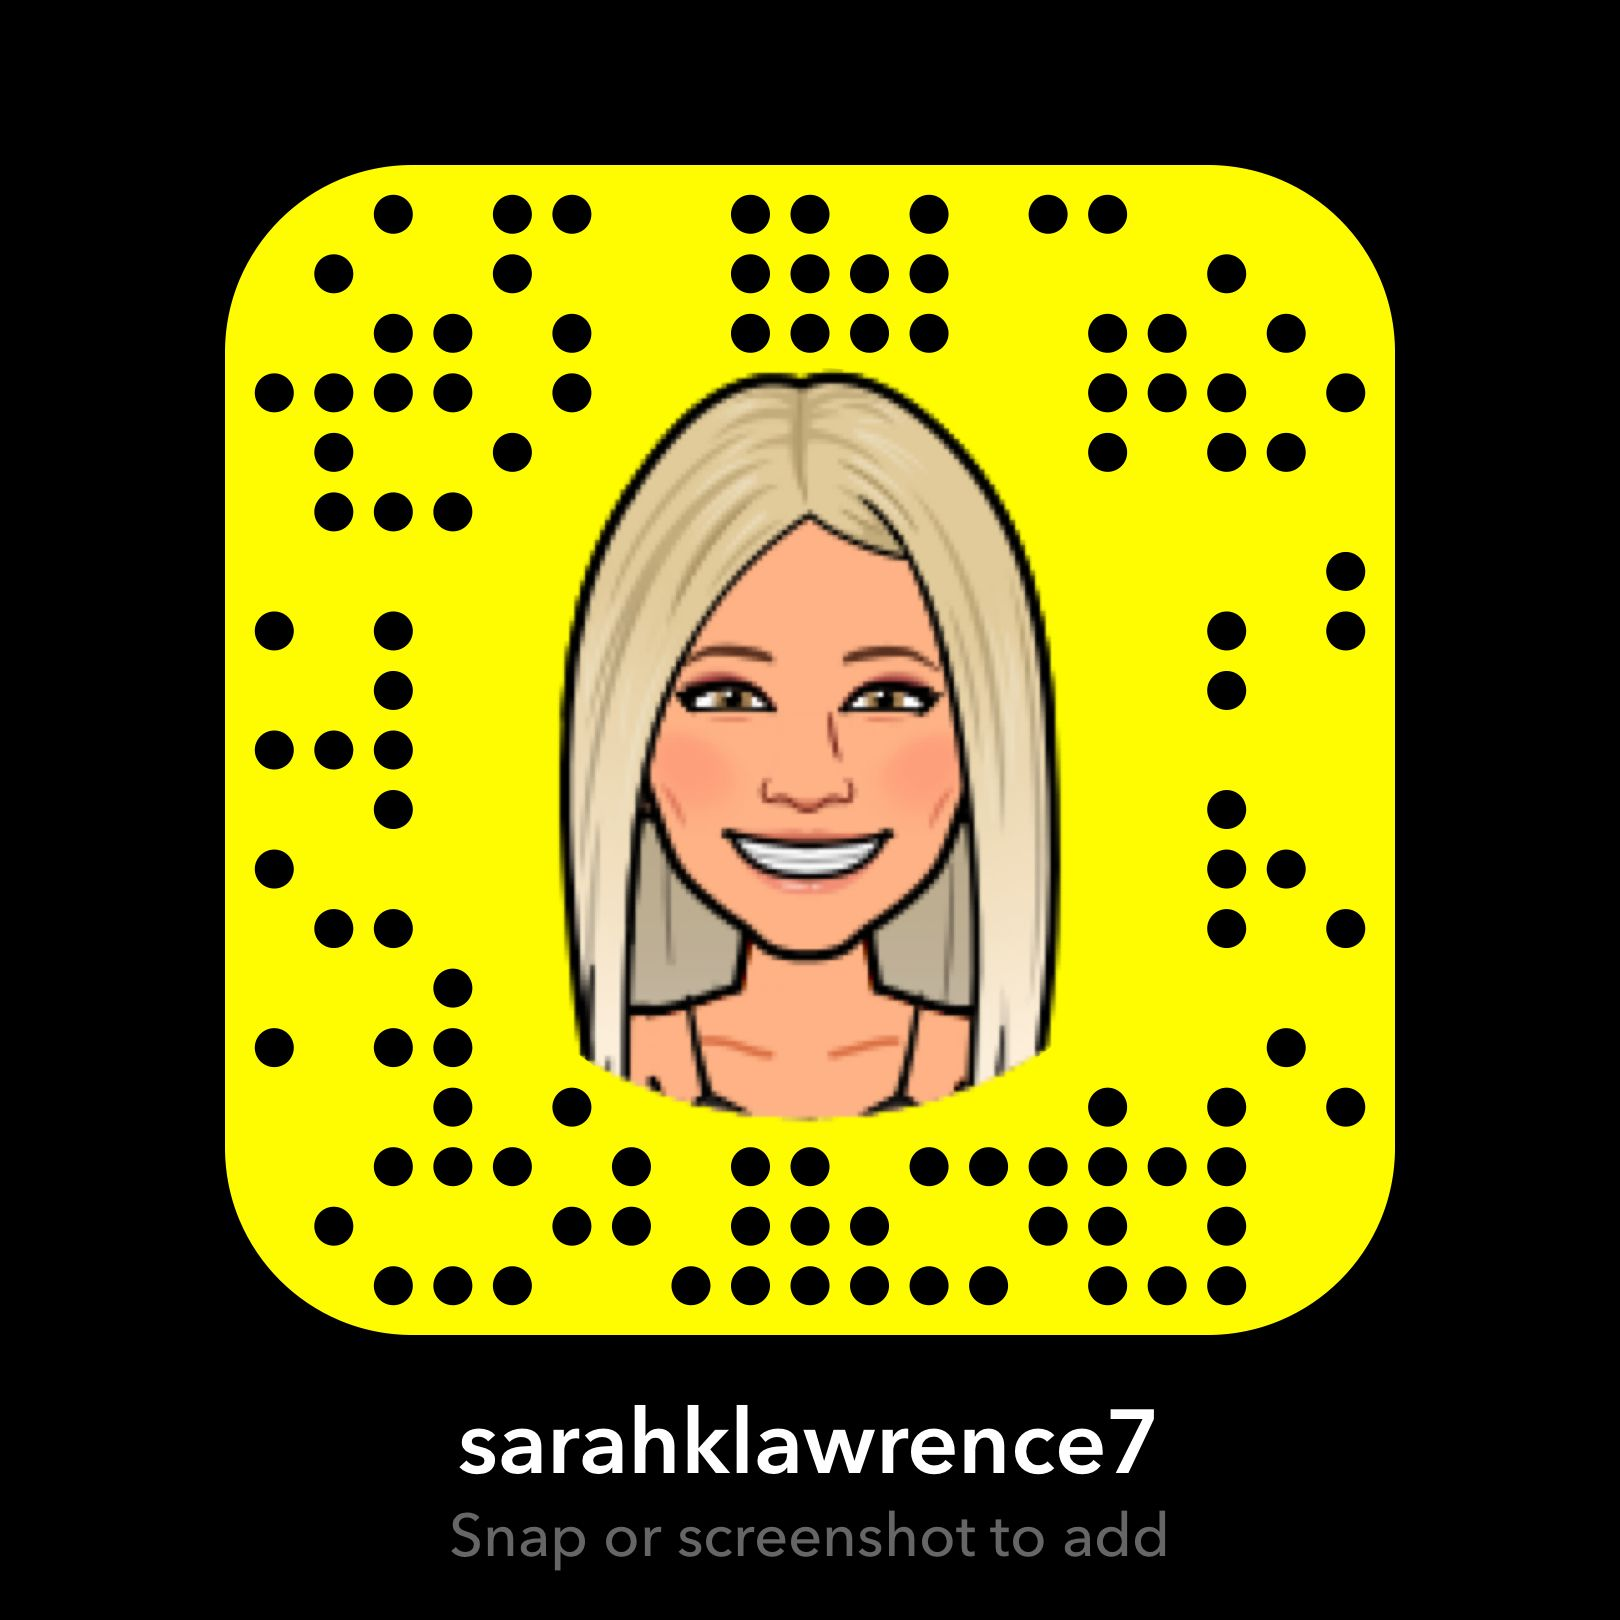 can you still secretly screenshot on snapchat